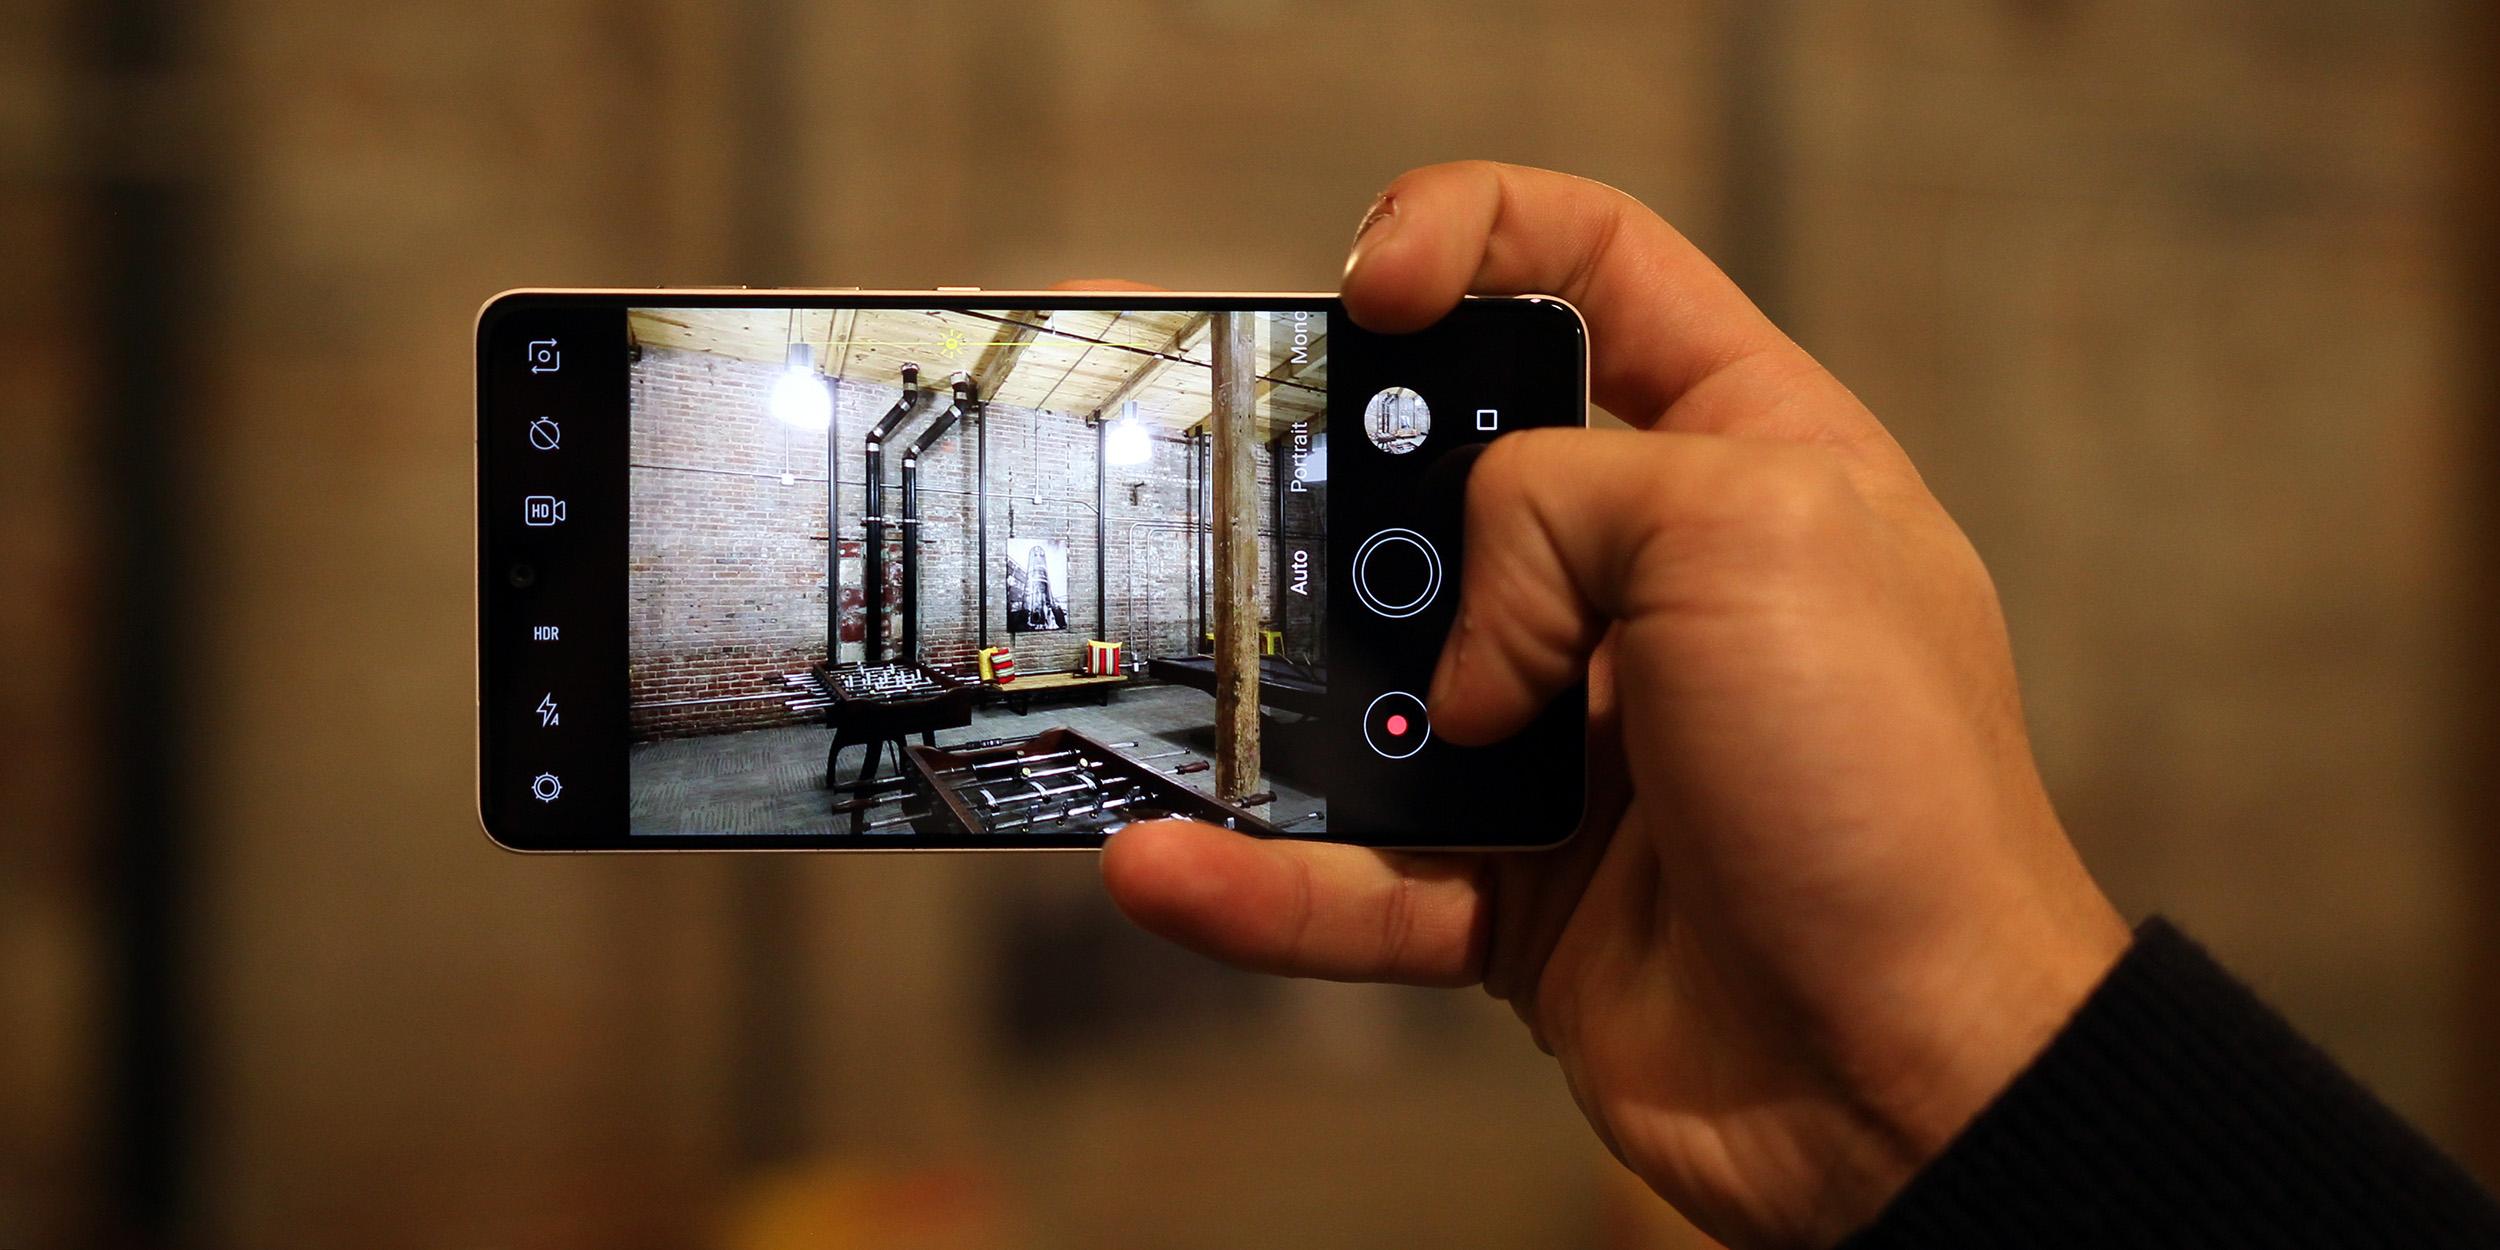 Google pixel 2 camera apk for essential phone | How to get